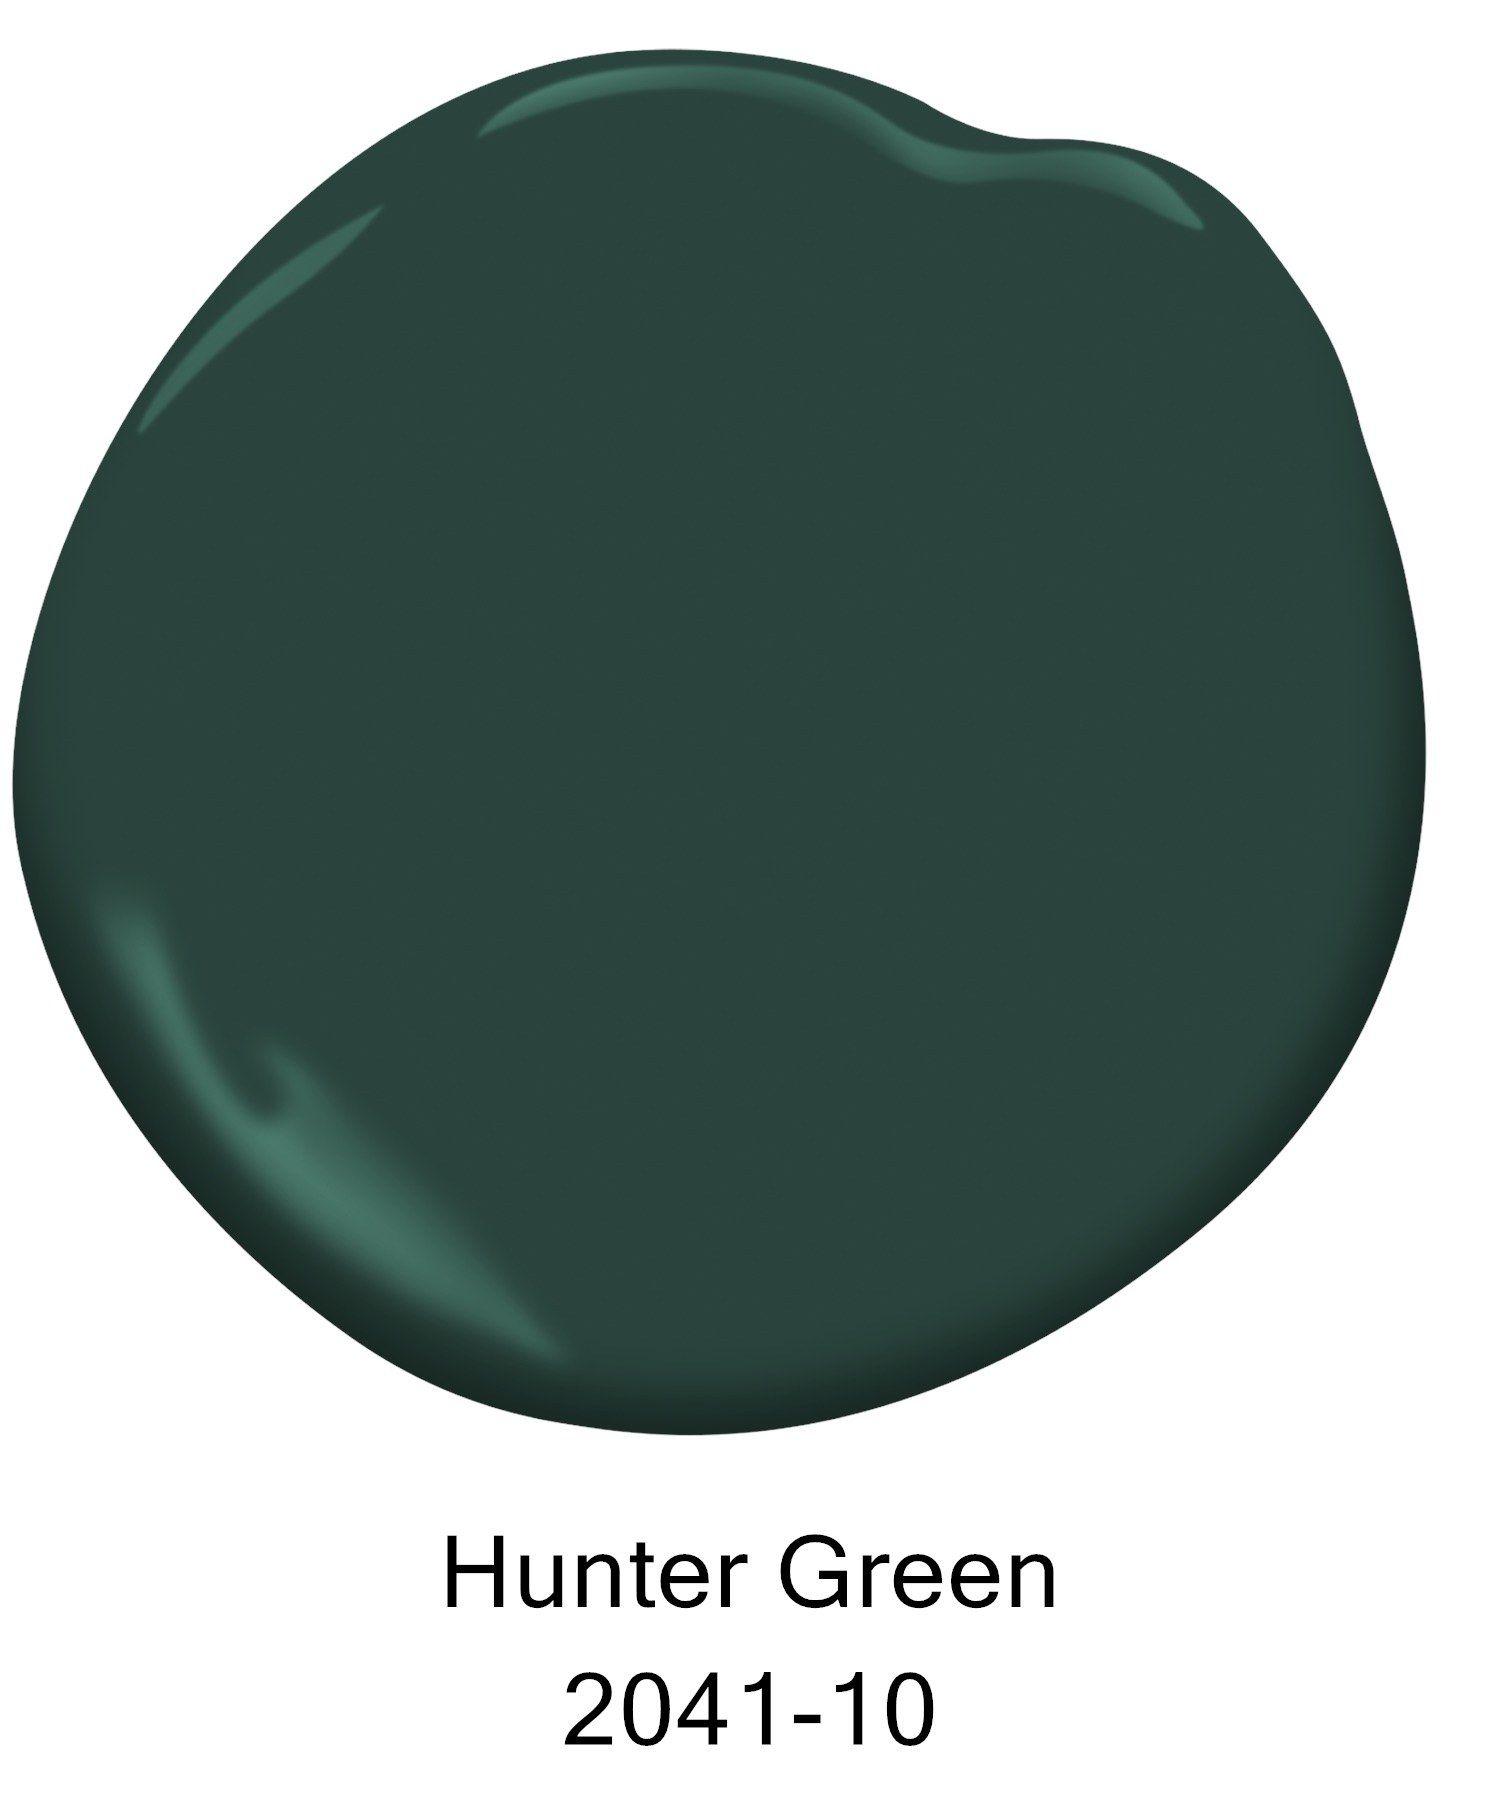 15 Top Selling Benjamin Moore Paint Colors In 2020